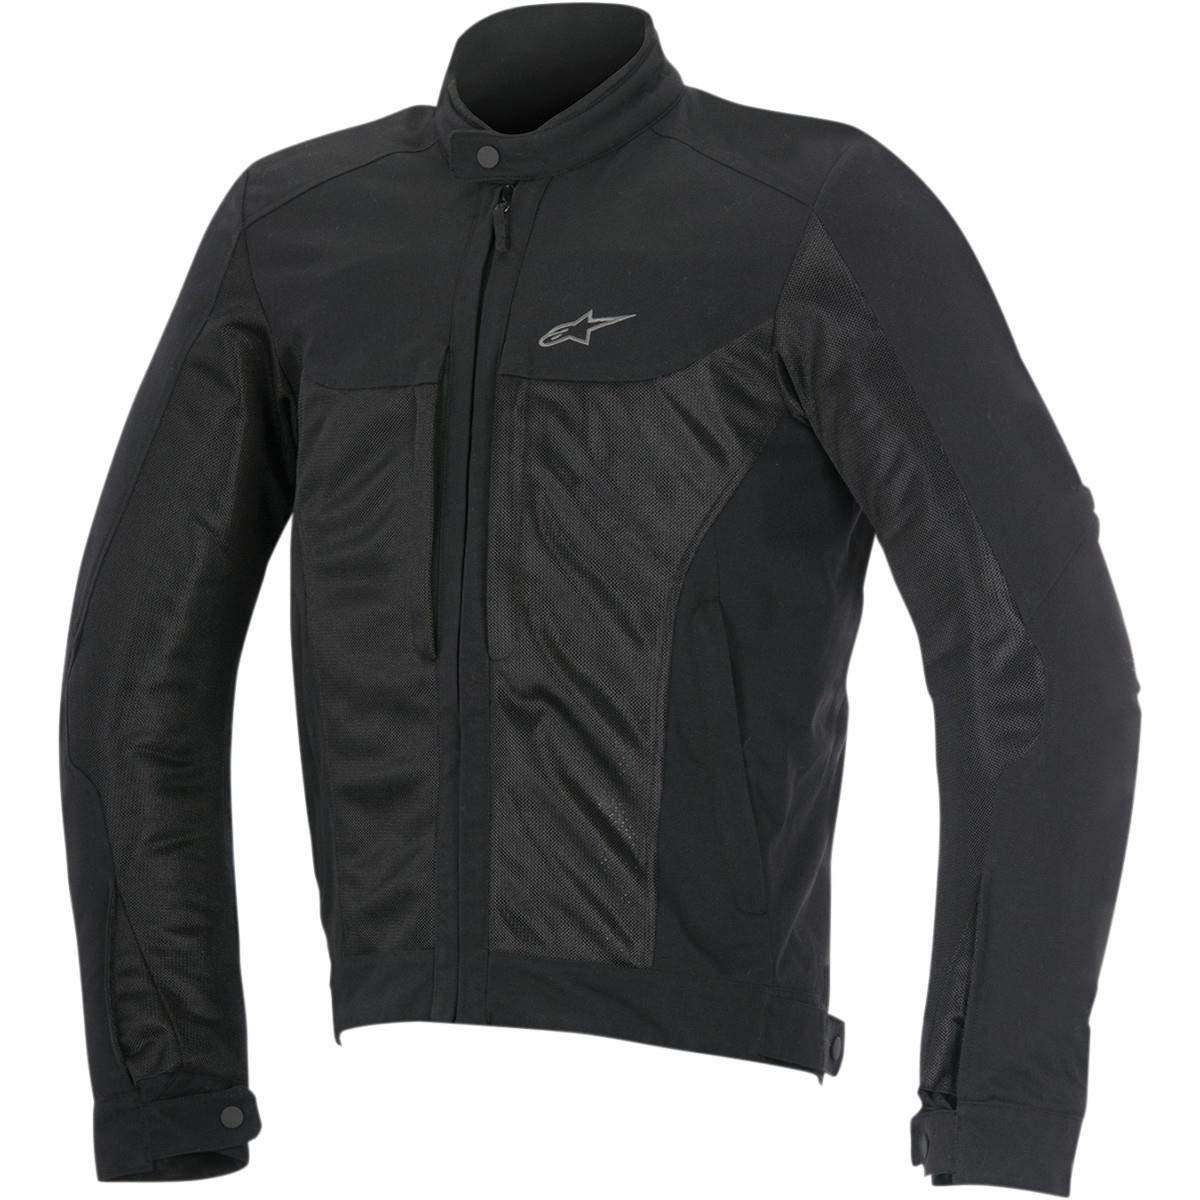 Alpinestars Chaqueta para Moto Luc Air, Color Negro, Talla M ...